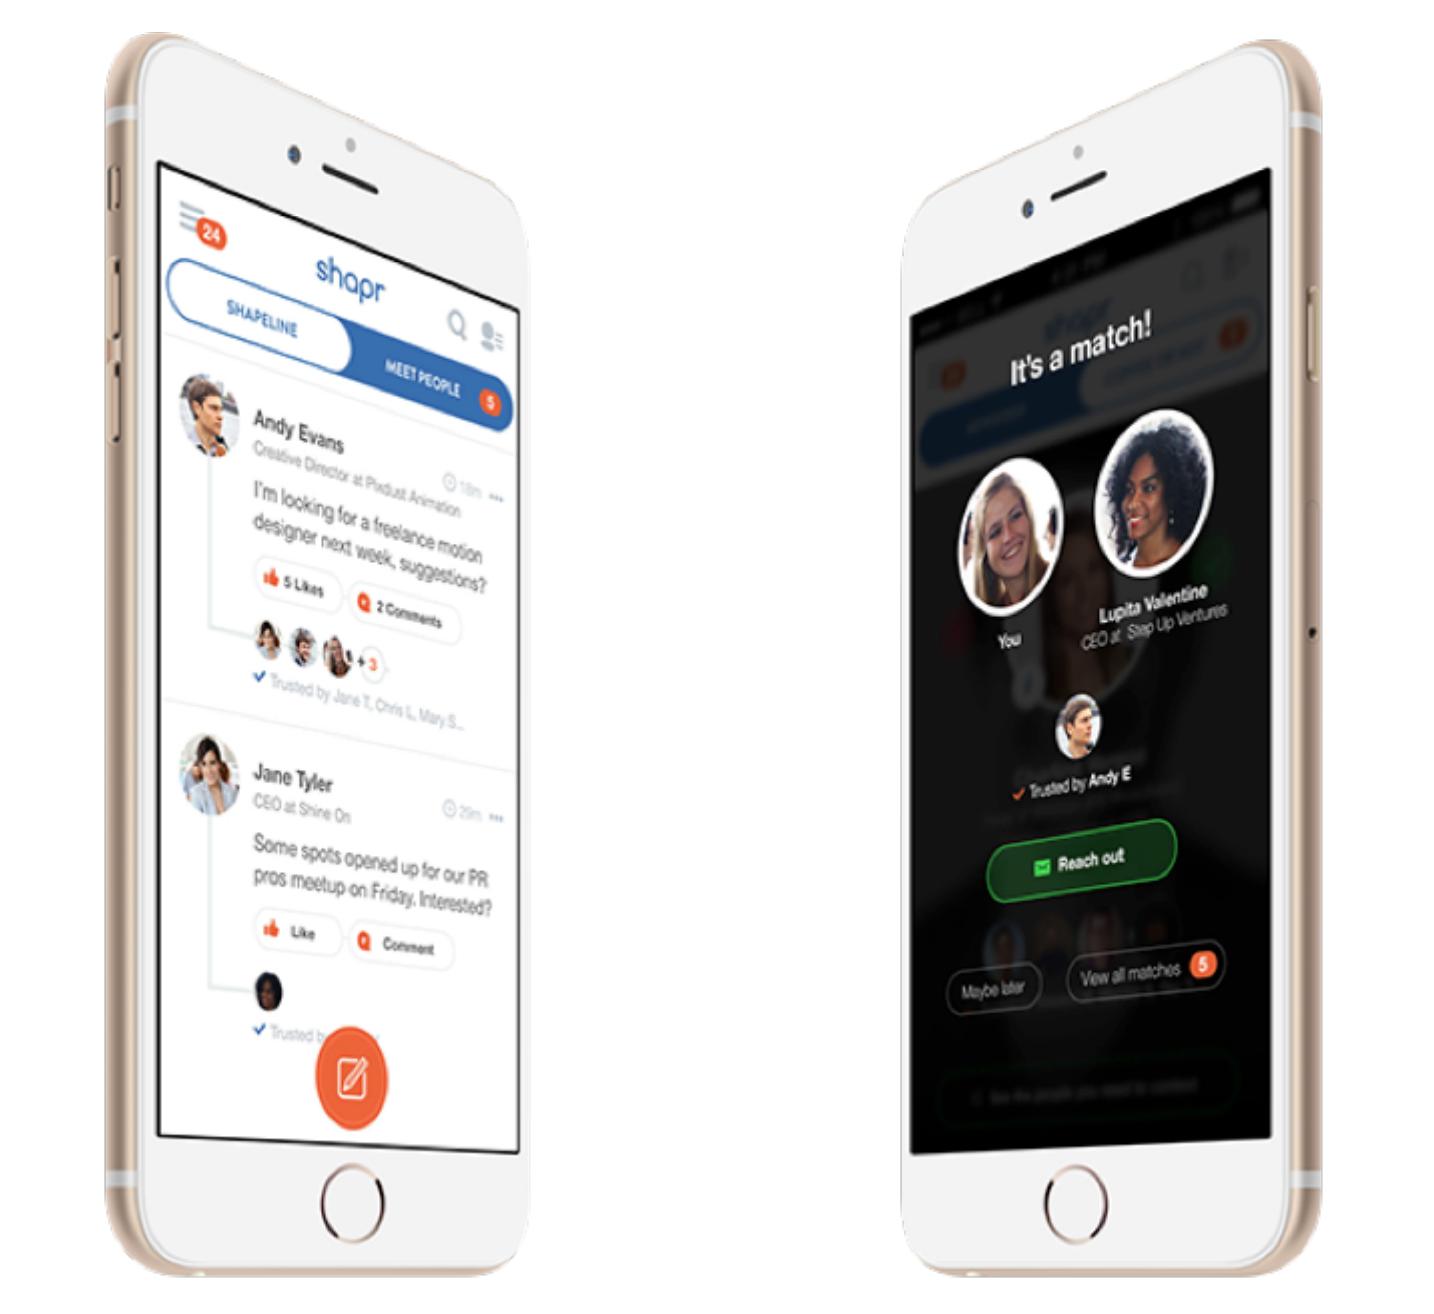 Shapr app tinder career networking